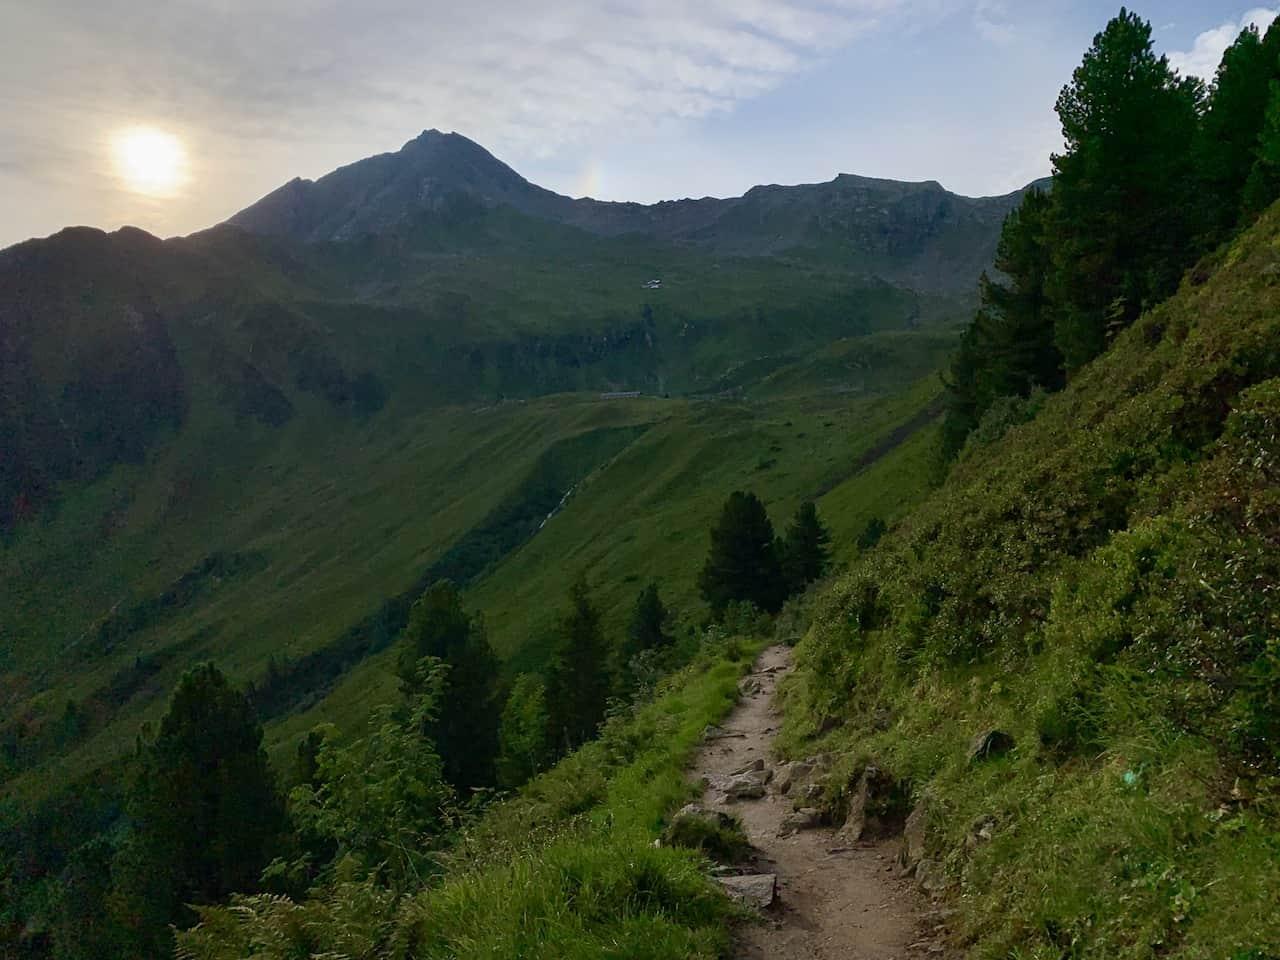 Ahorn Mountain Greenery